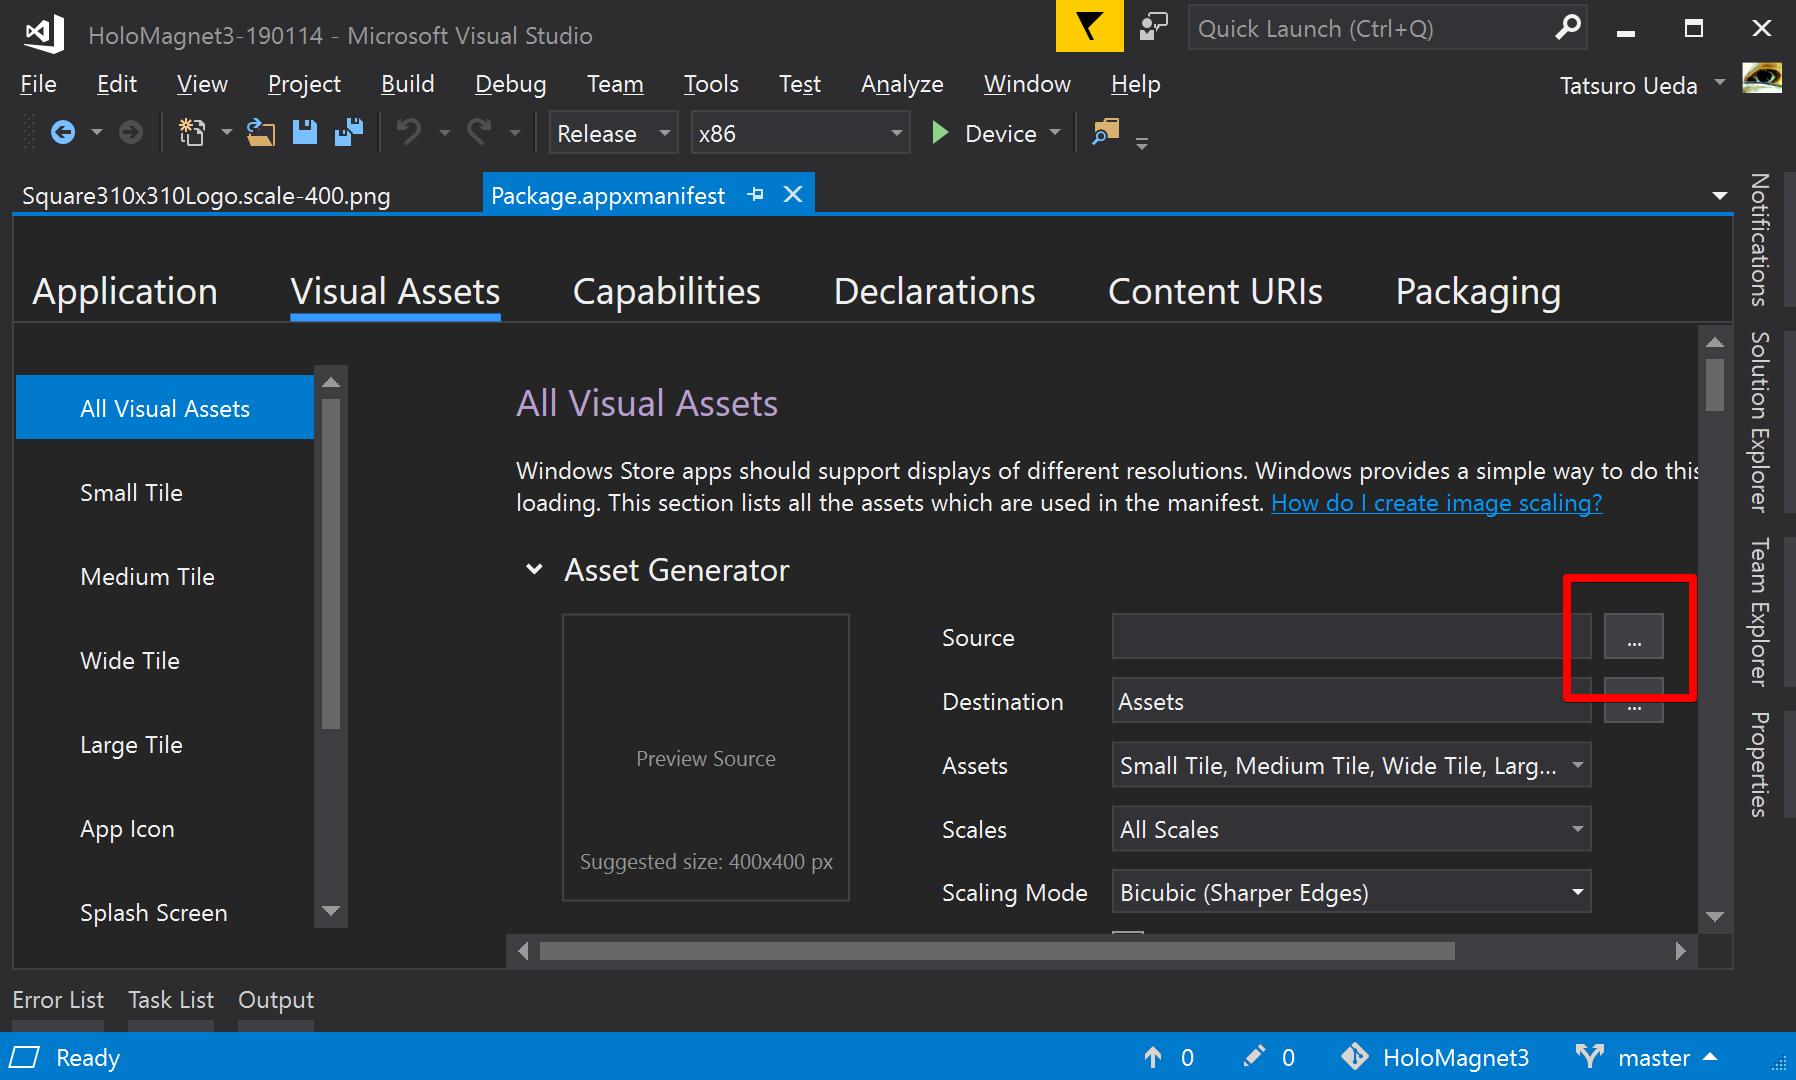 HoloMagnet3-190114 - Microsoft Visual Studio 2019-05-20 10 24 57